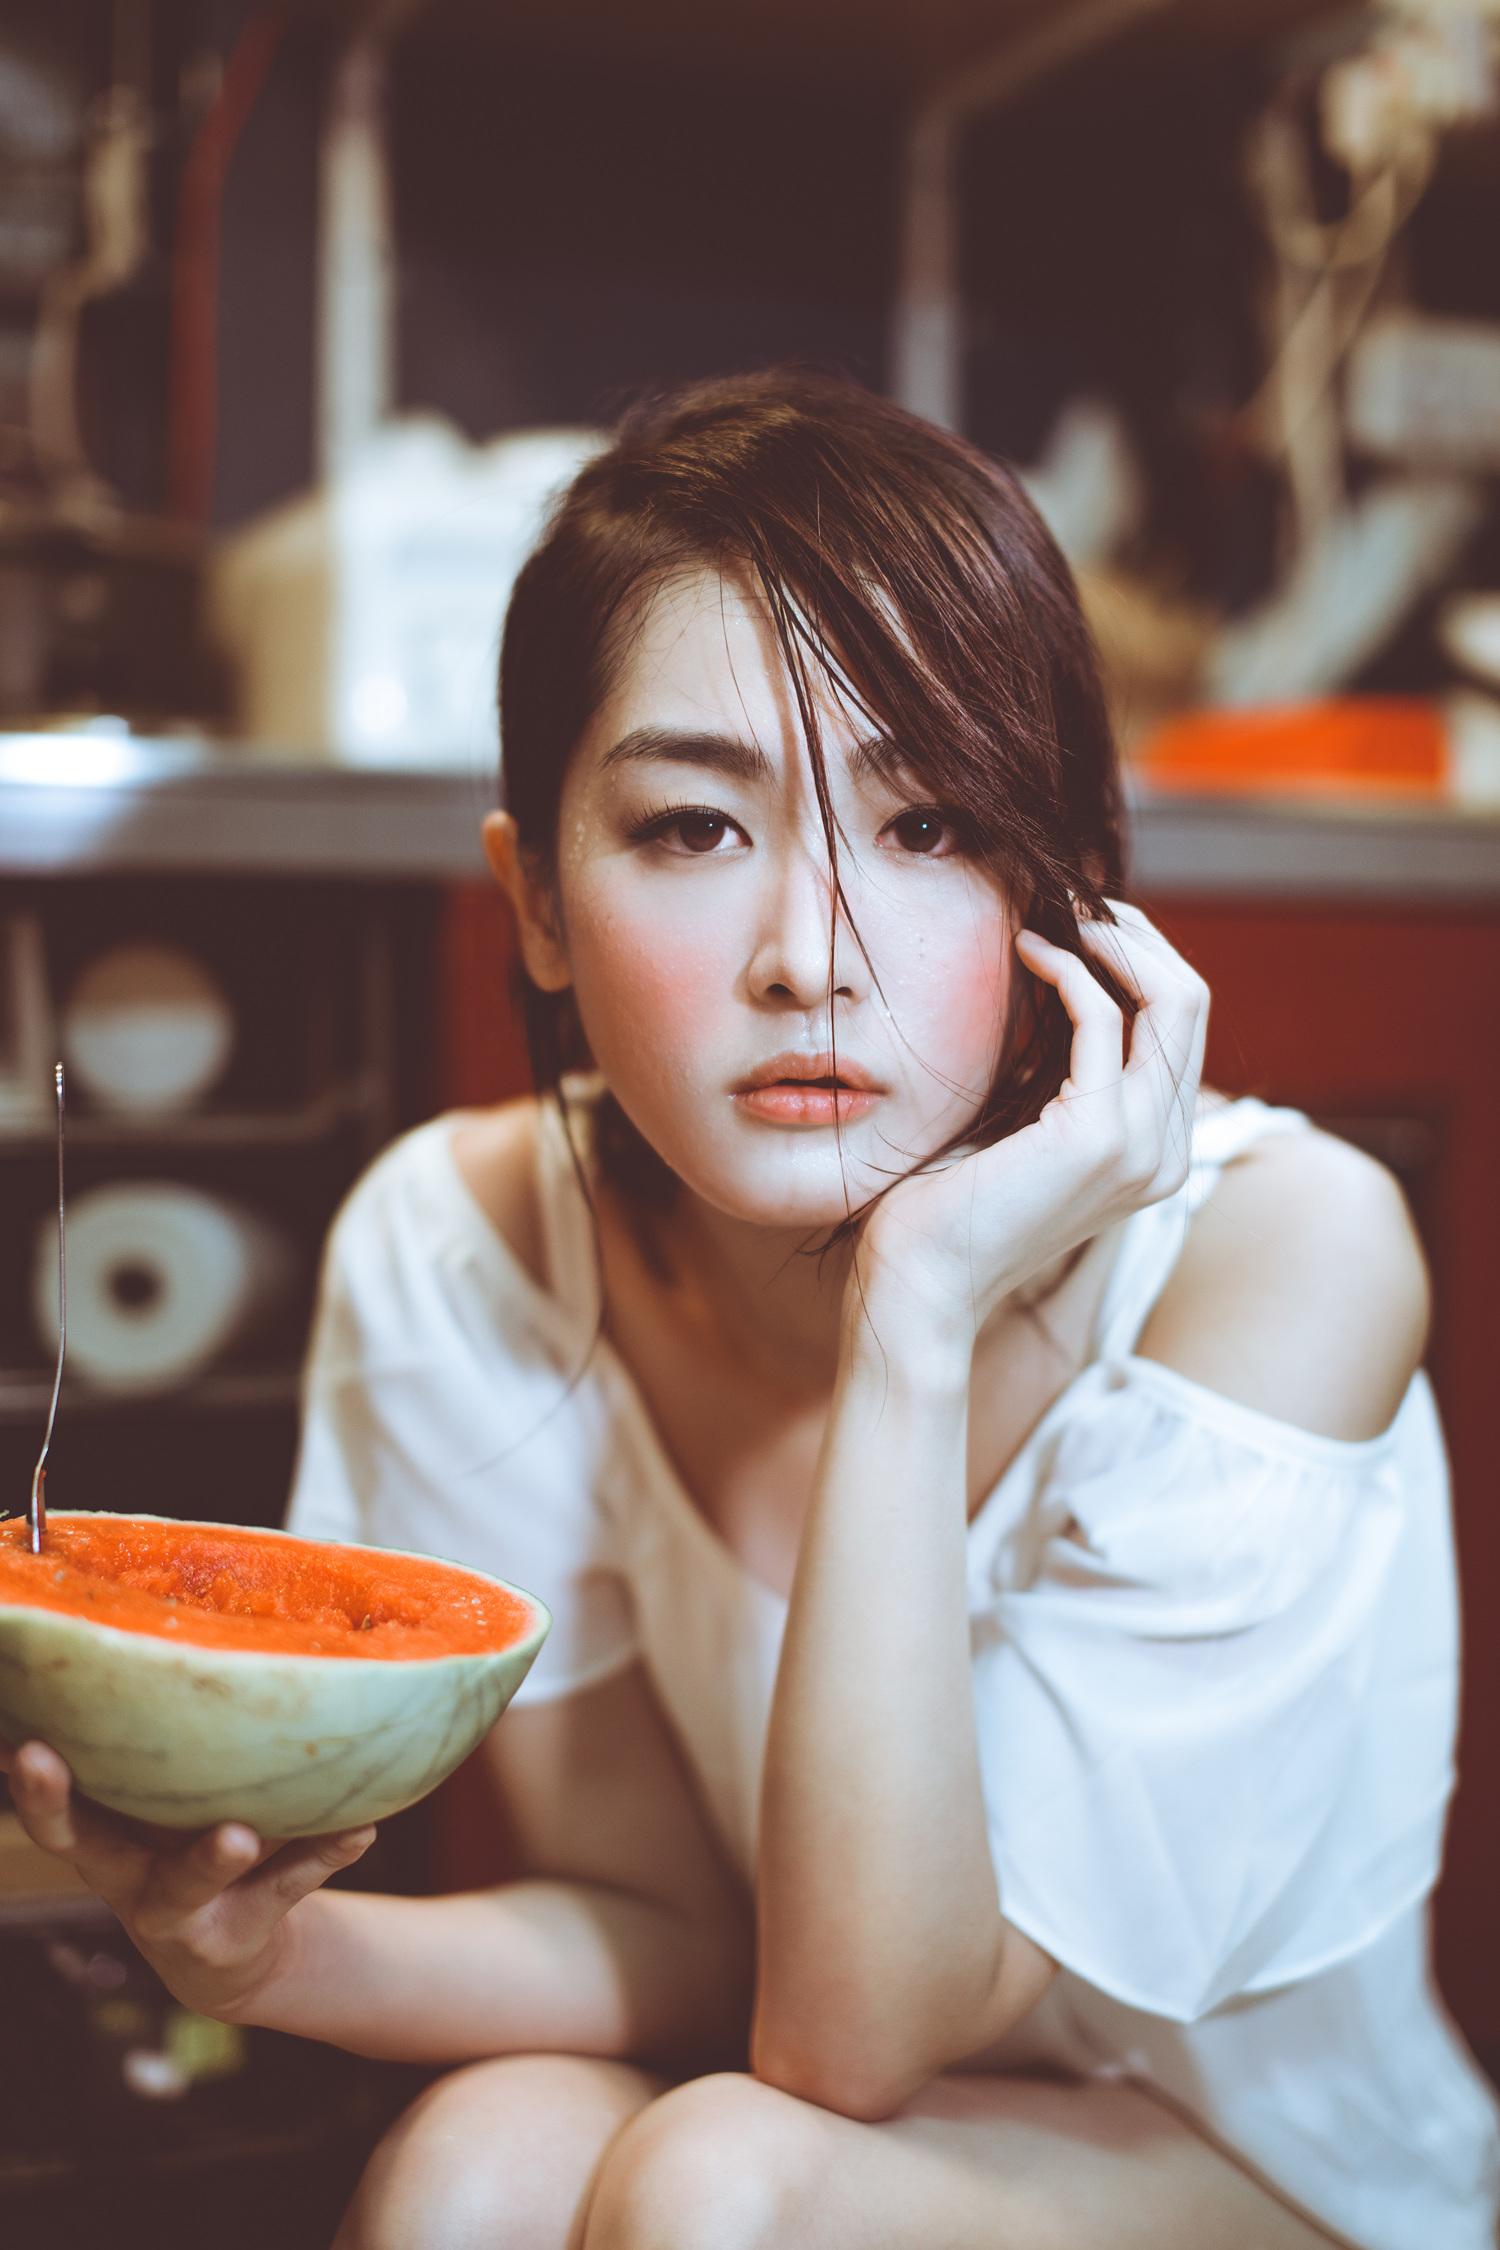 Michele Chan Net Worth